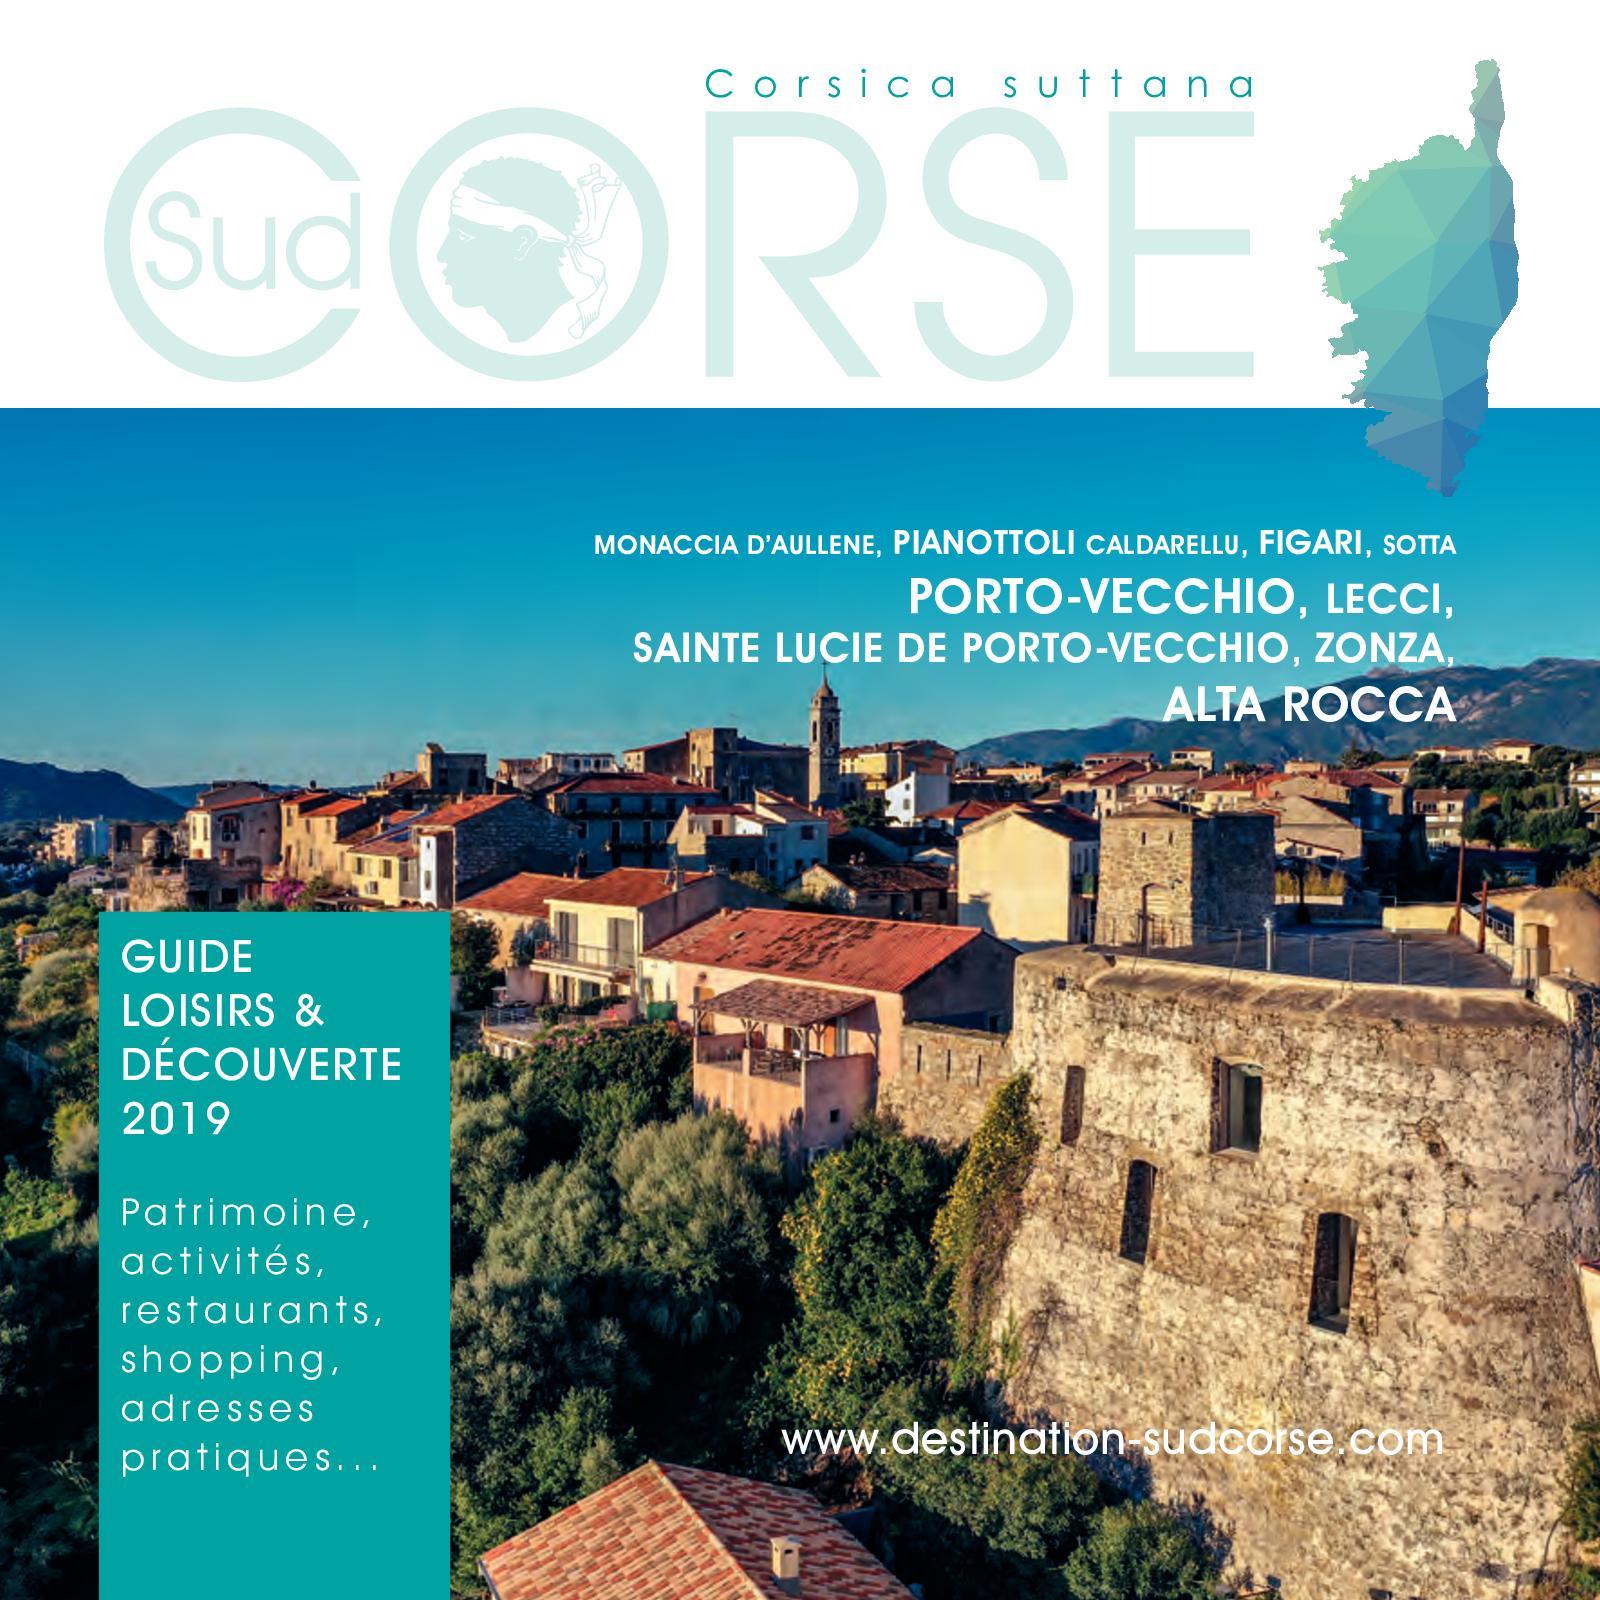 Piaceri 2019 Vecchio TurismoGuida E Scoperta Porto Calaméo 6gyvYIbf7